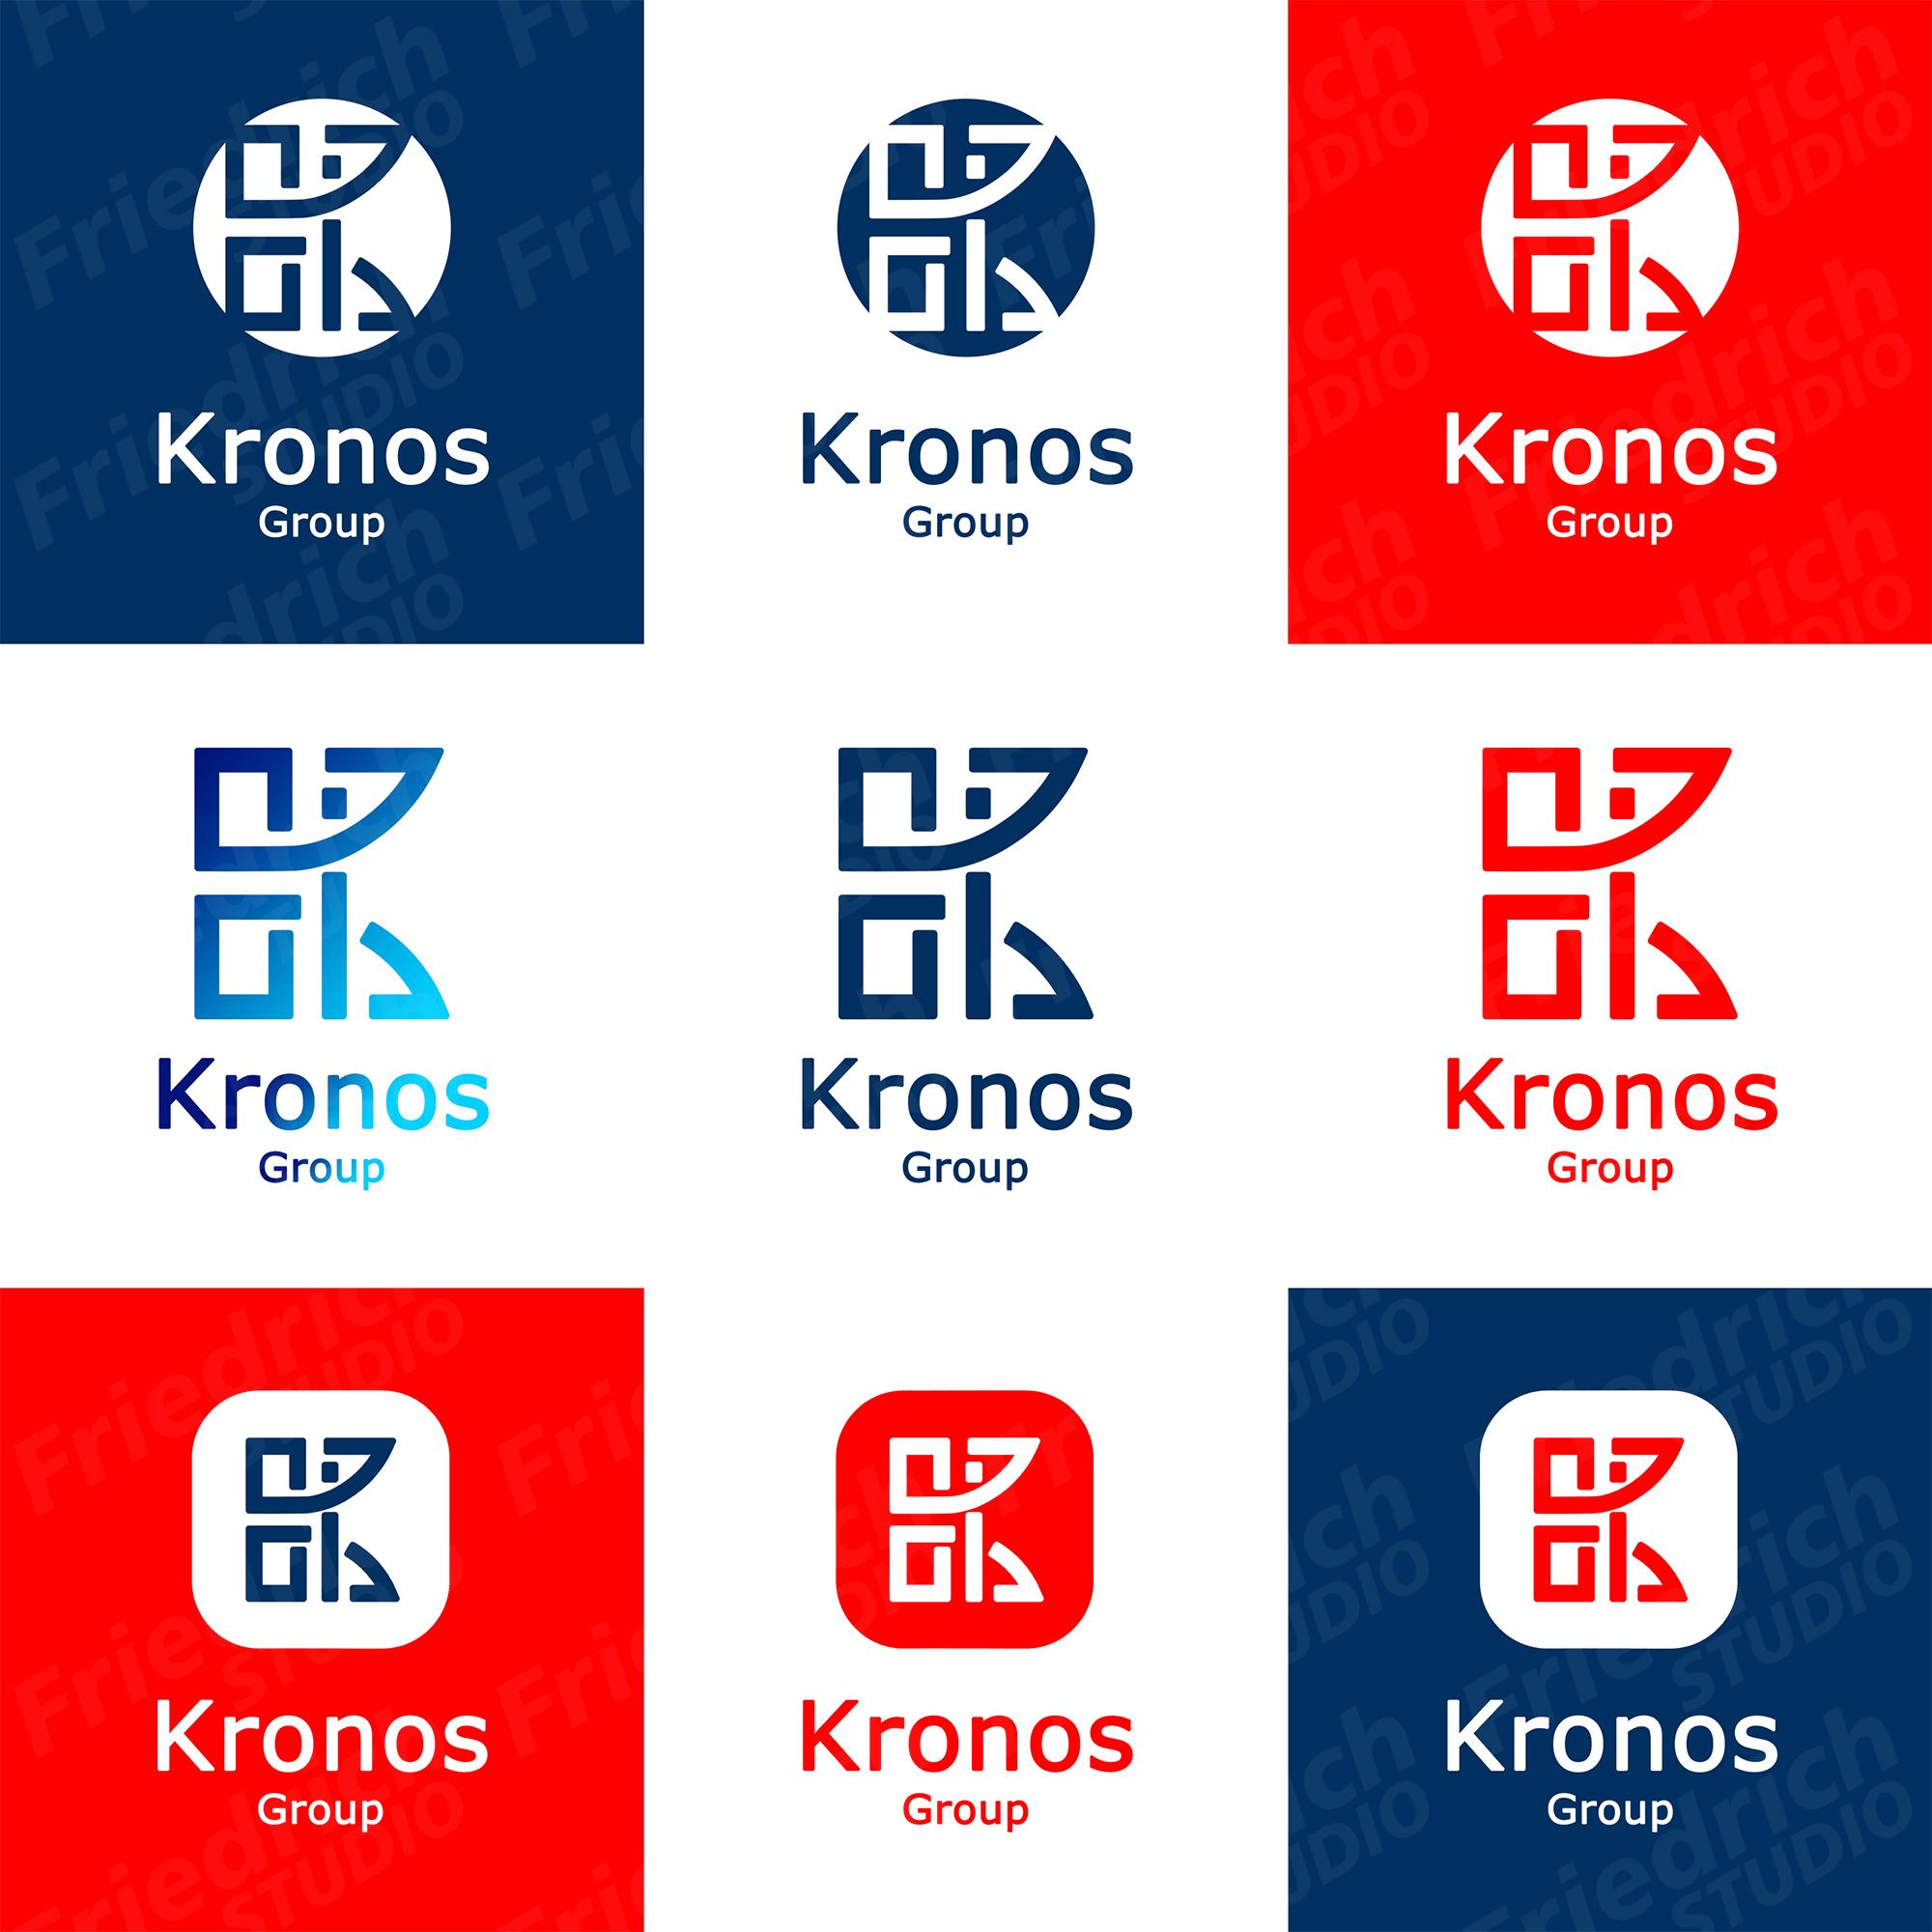 Разработать логотип KRONOS фото f_0765fafec03bb3d5.jpg